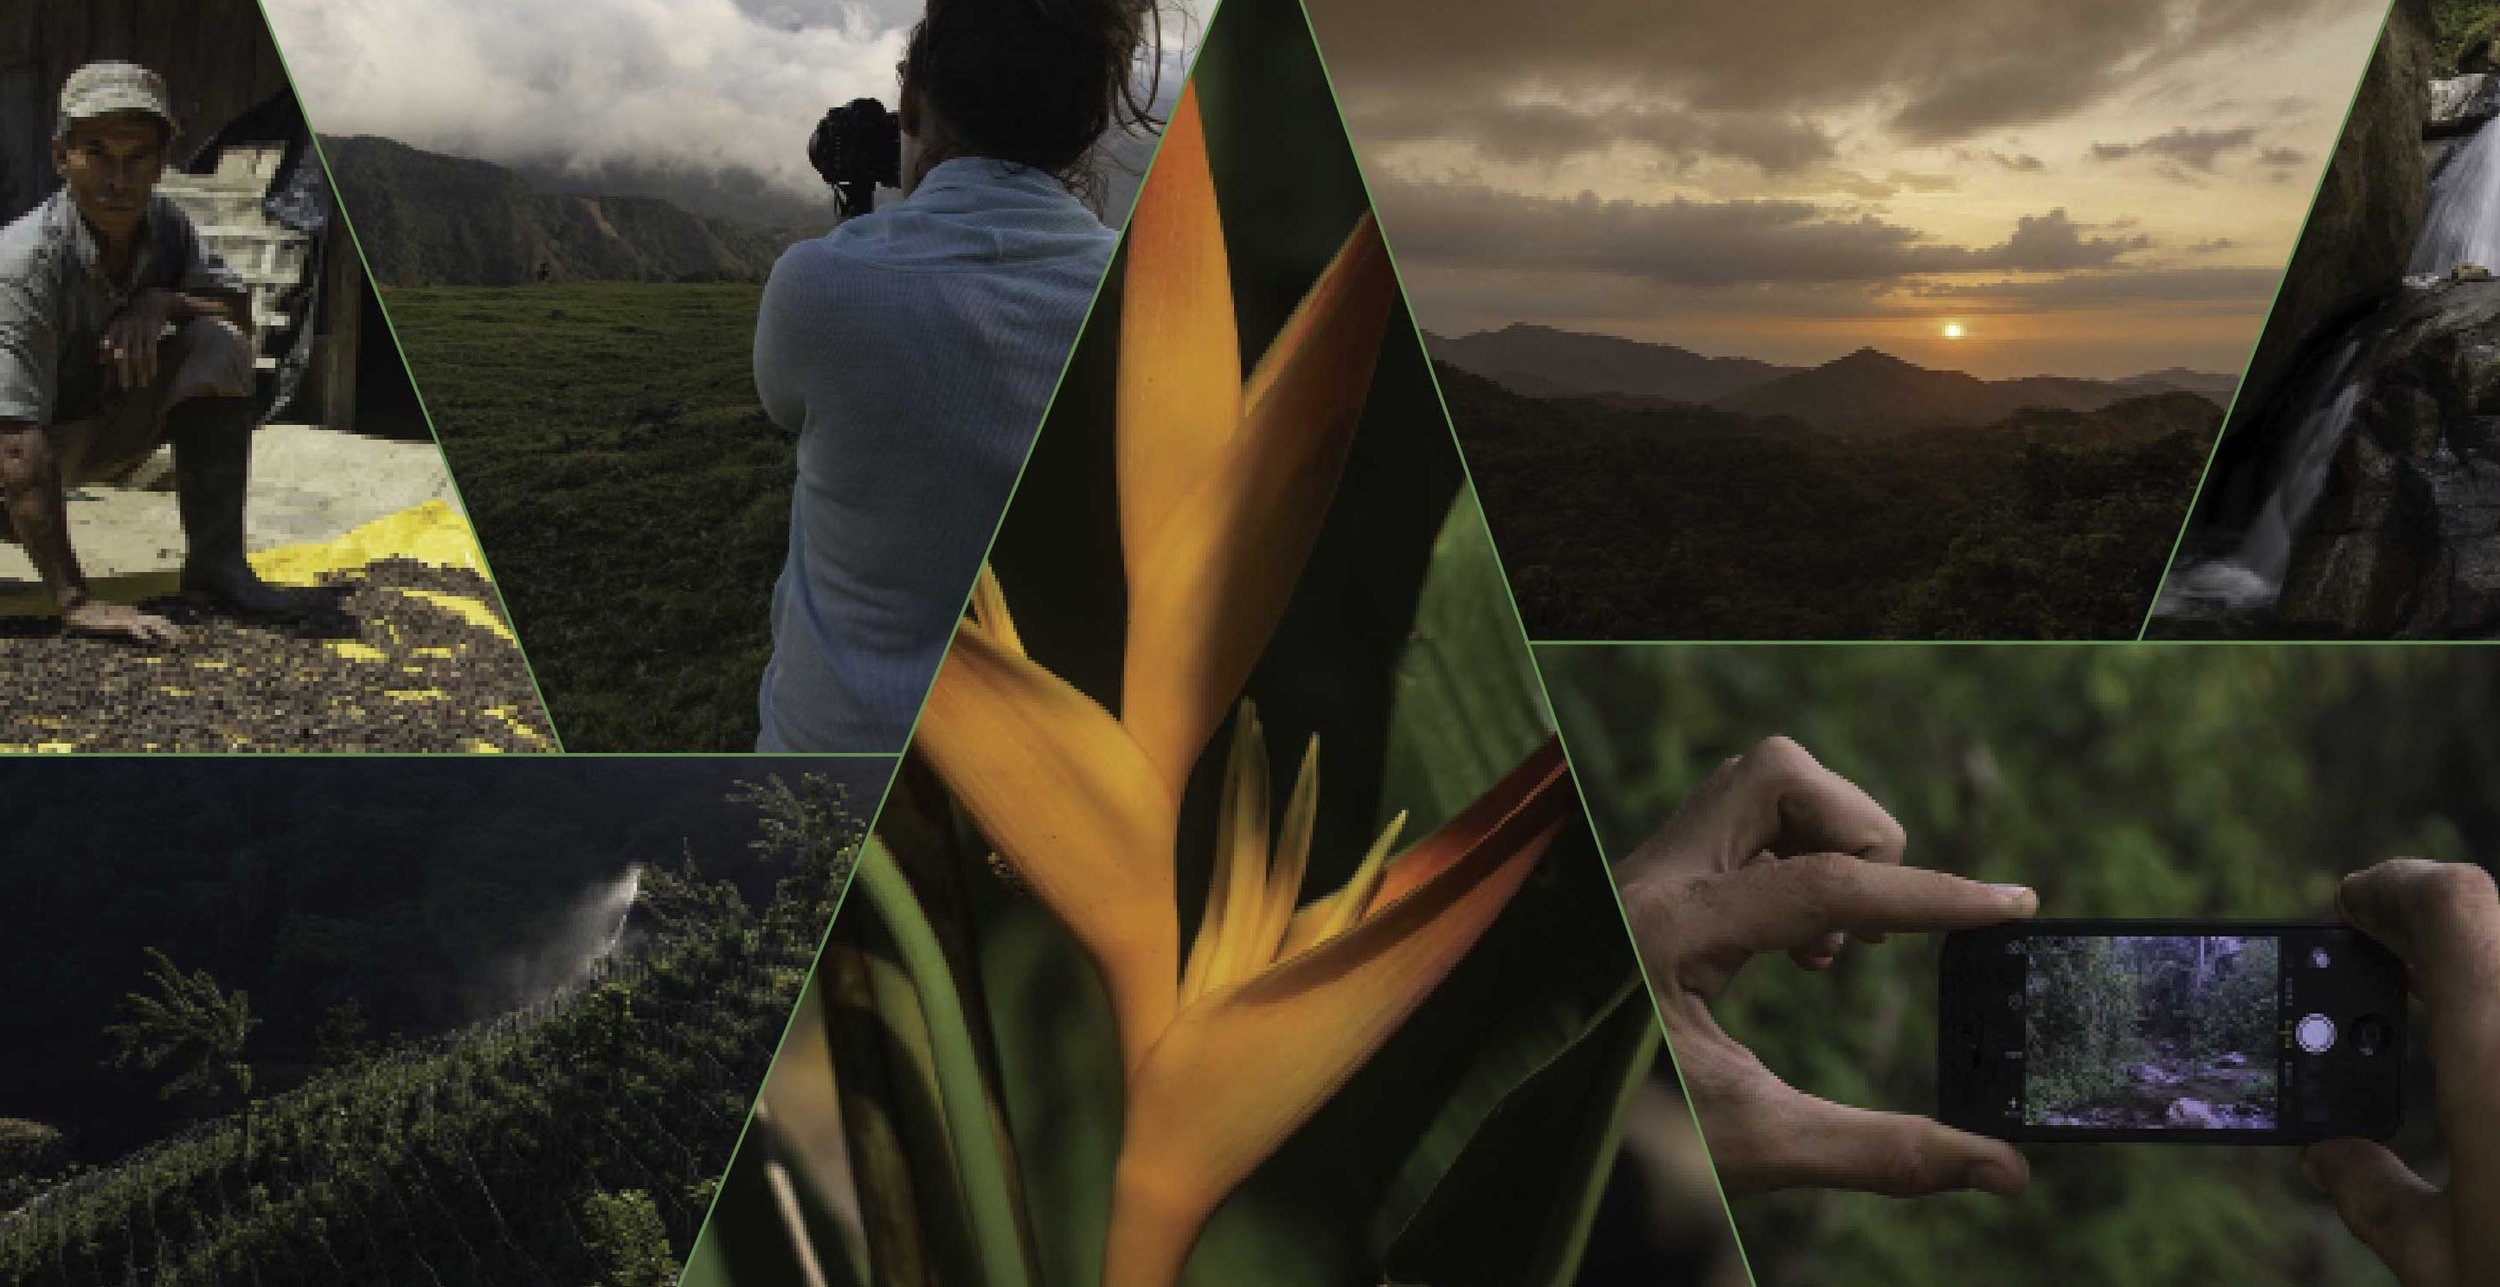 FotoTrails_A3-Poster-Bird-LR copy.jpg